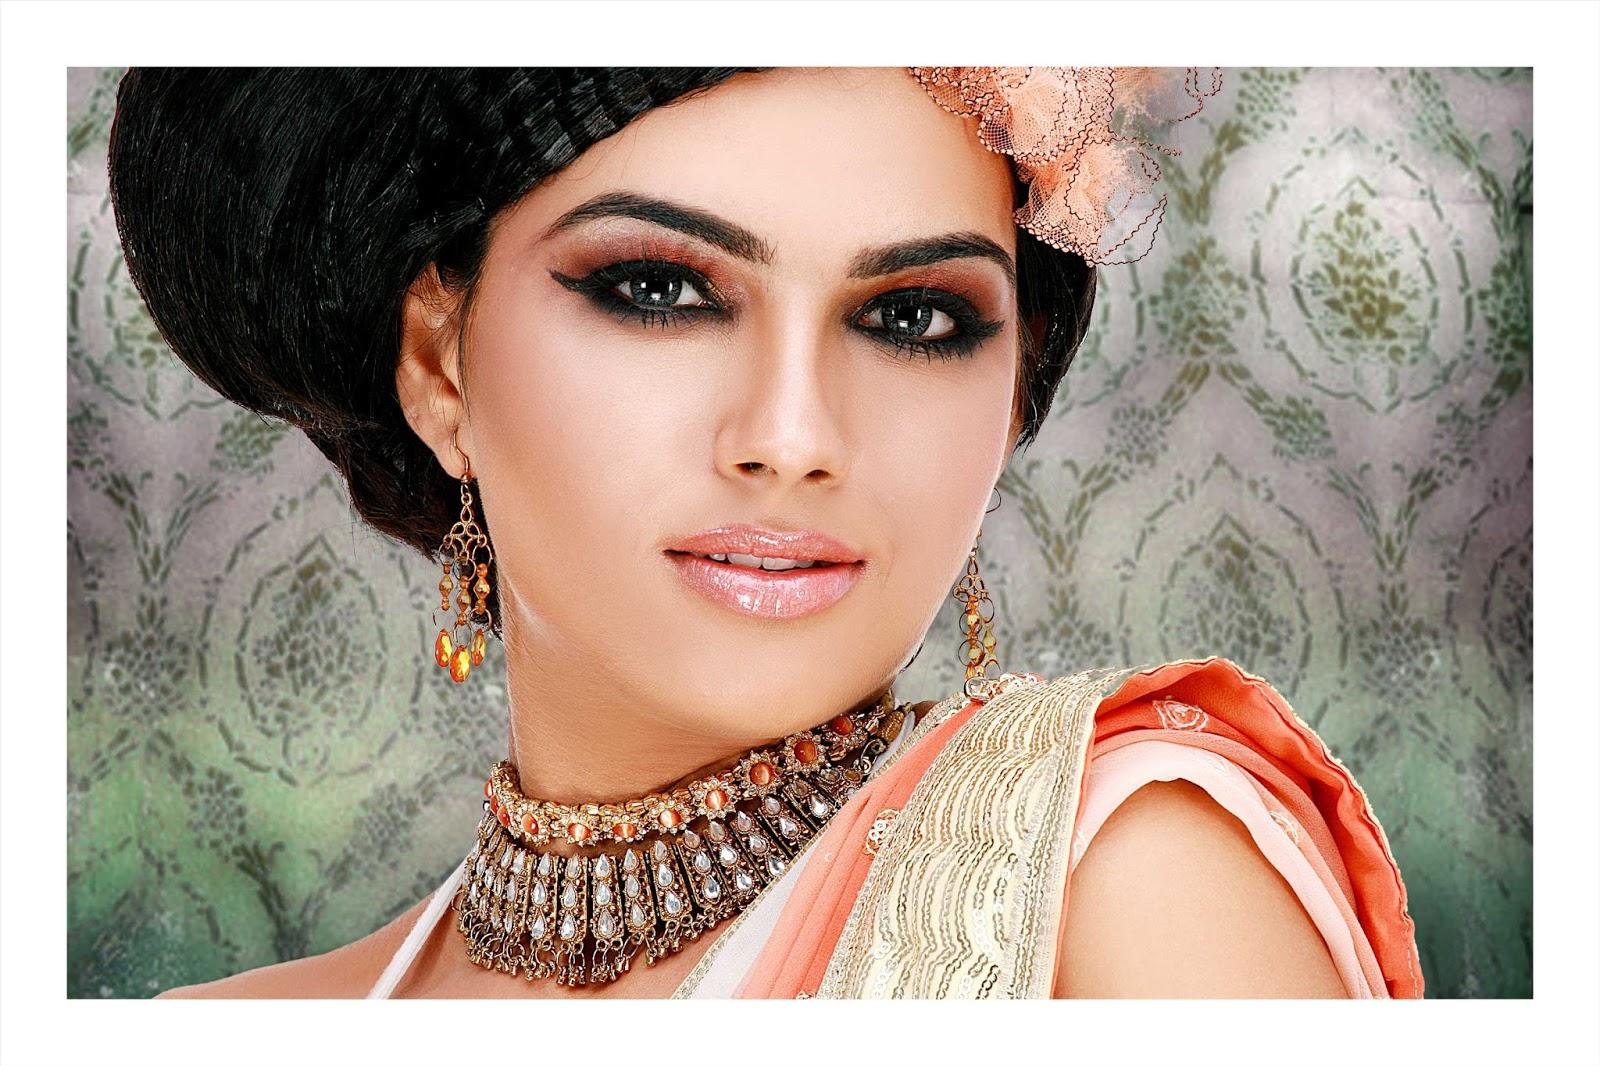 салат индийские модели фотосет фото